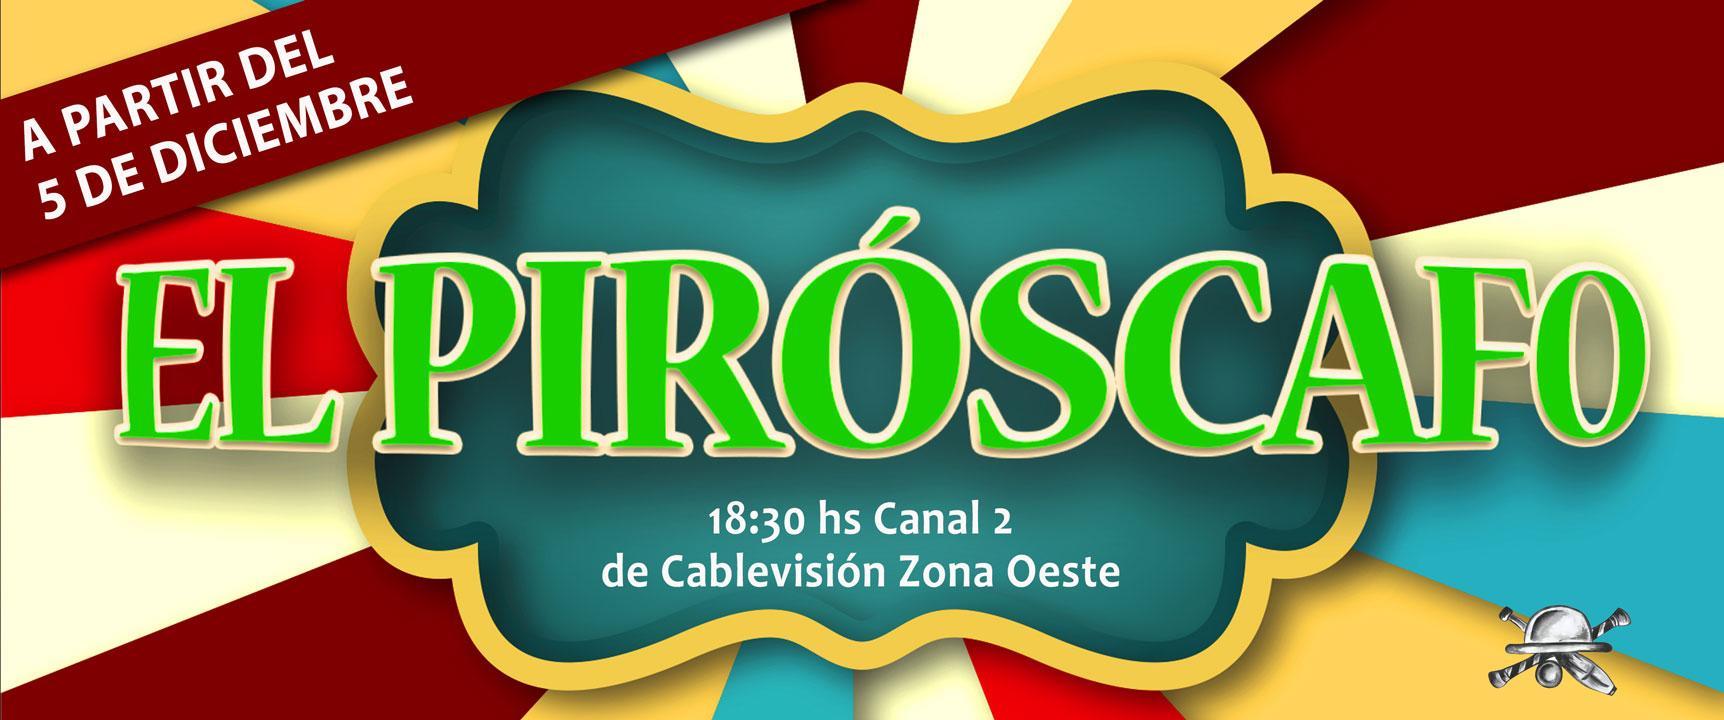 piroscafo-home.jpg